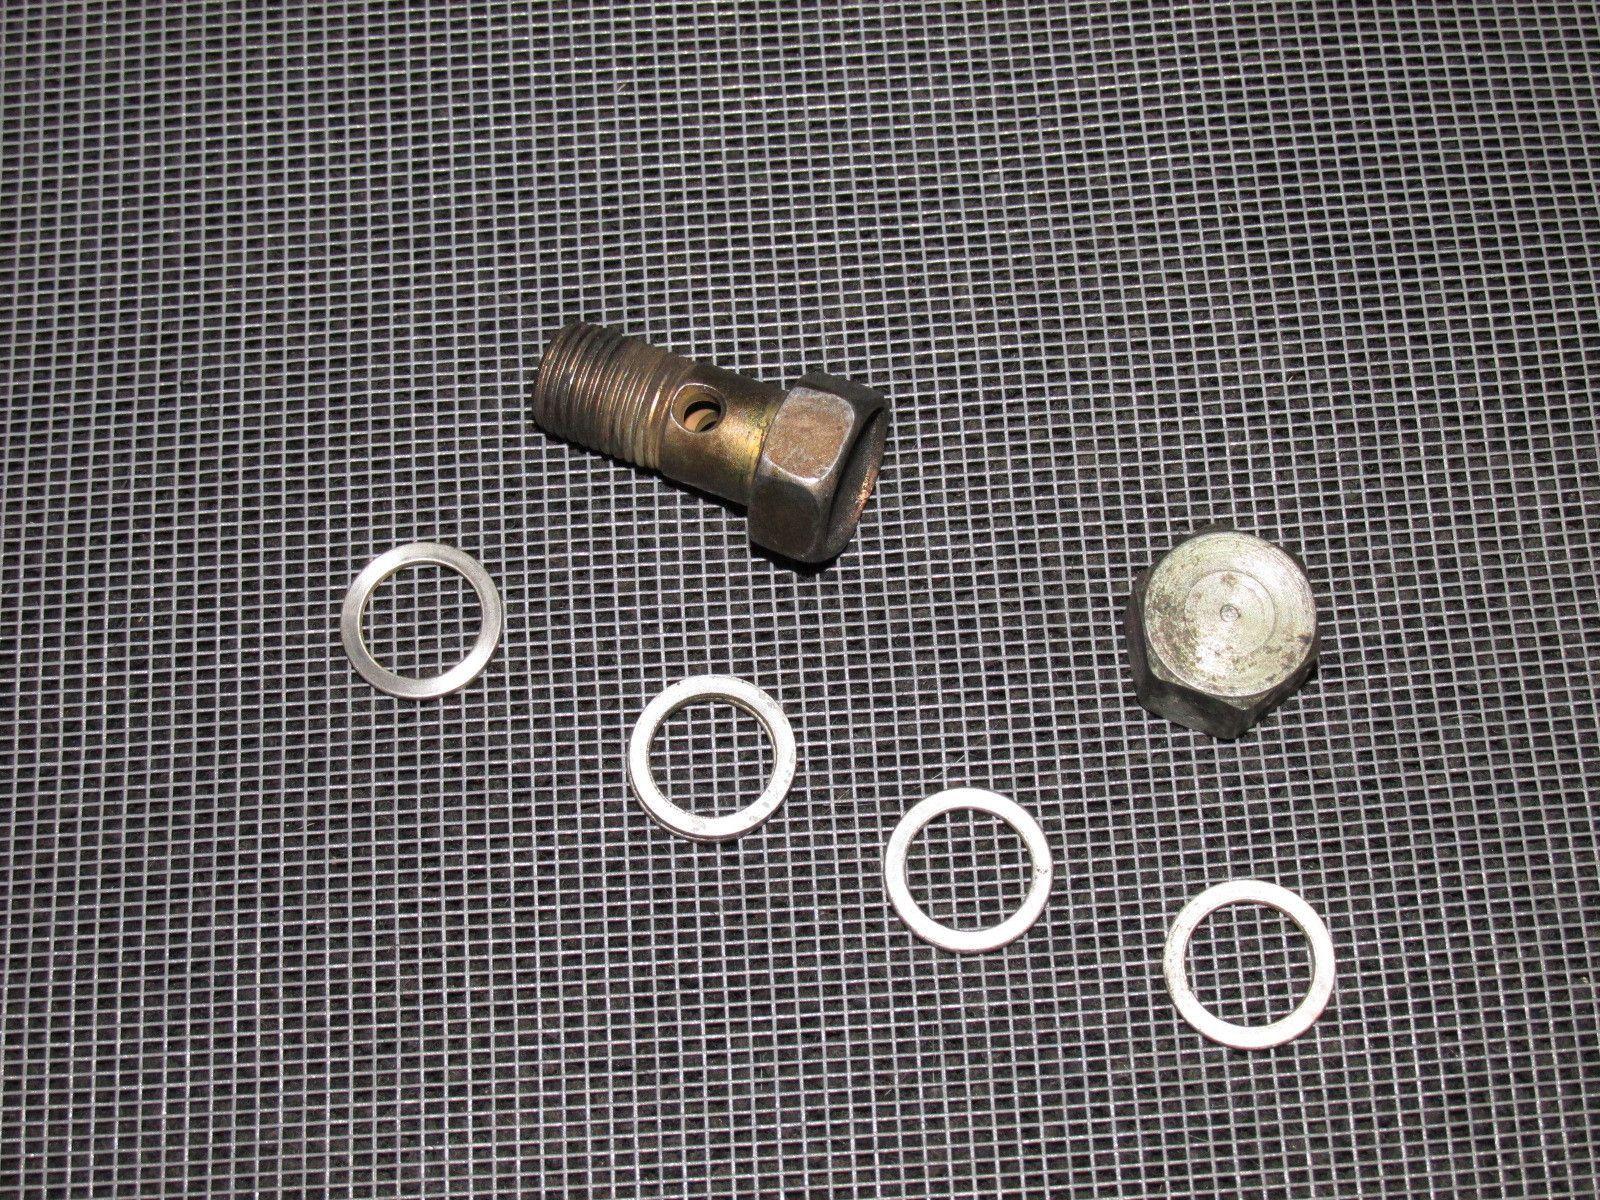 hight resolution of 96 97 98 99 00 honda civic oem fuel filter line banjo bolt